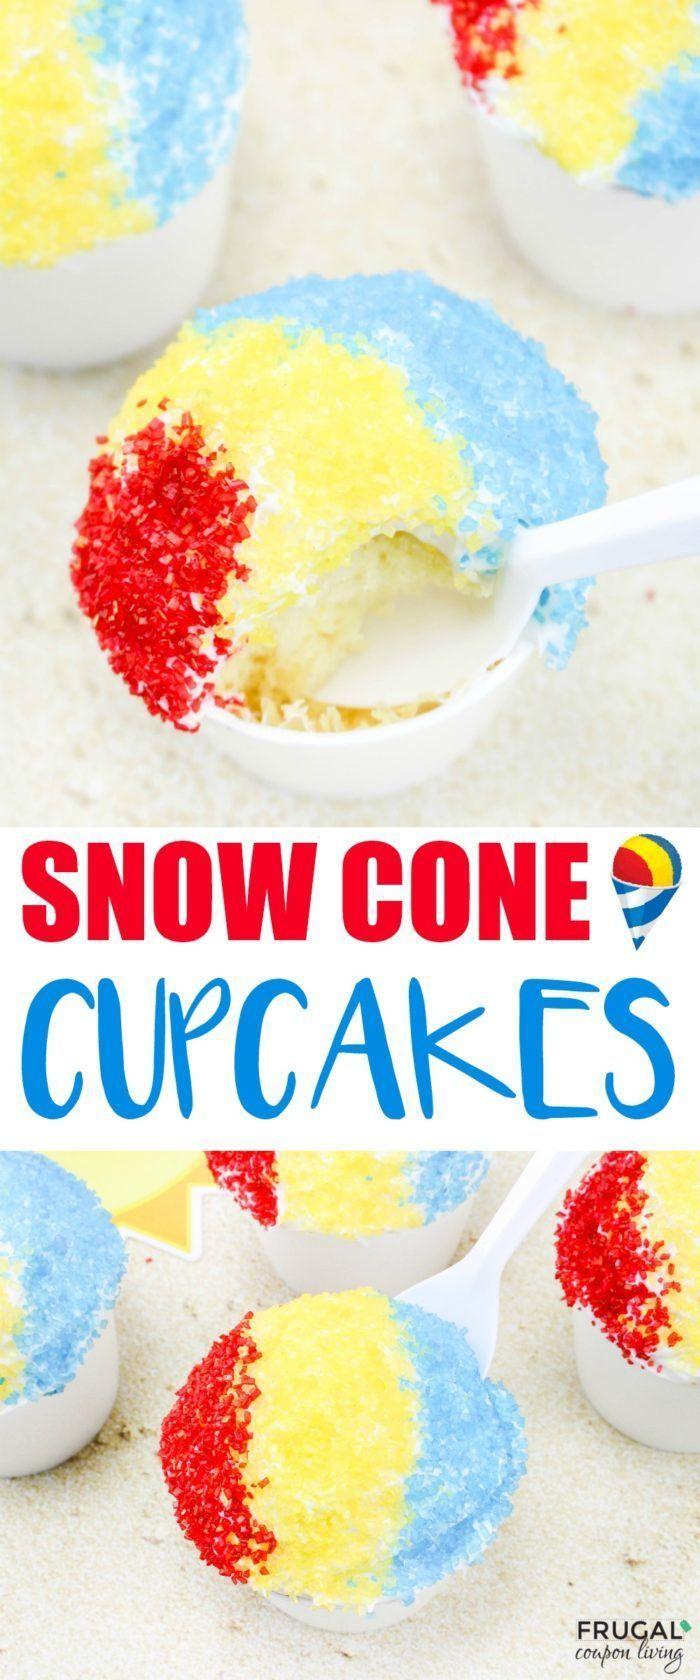 Enjoy the taste of summer with this dessert twist - Snow Cone Summer Cupcakes. M...